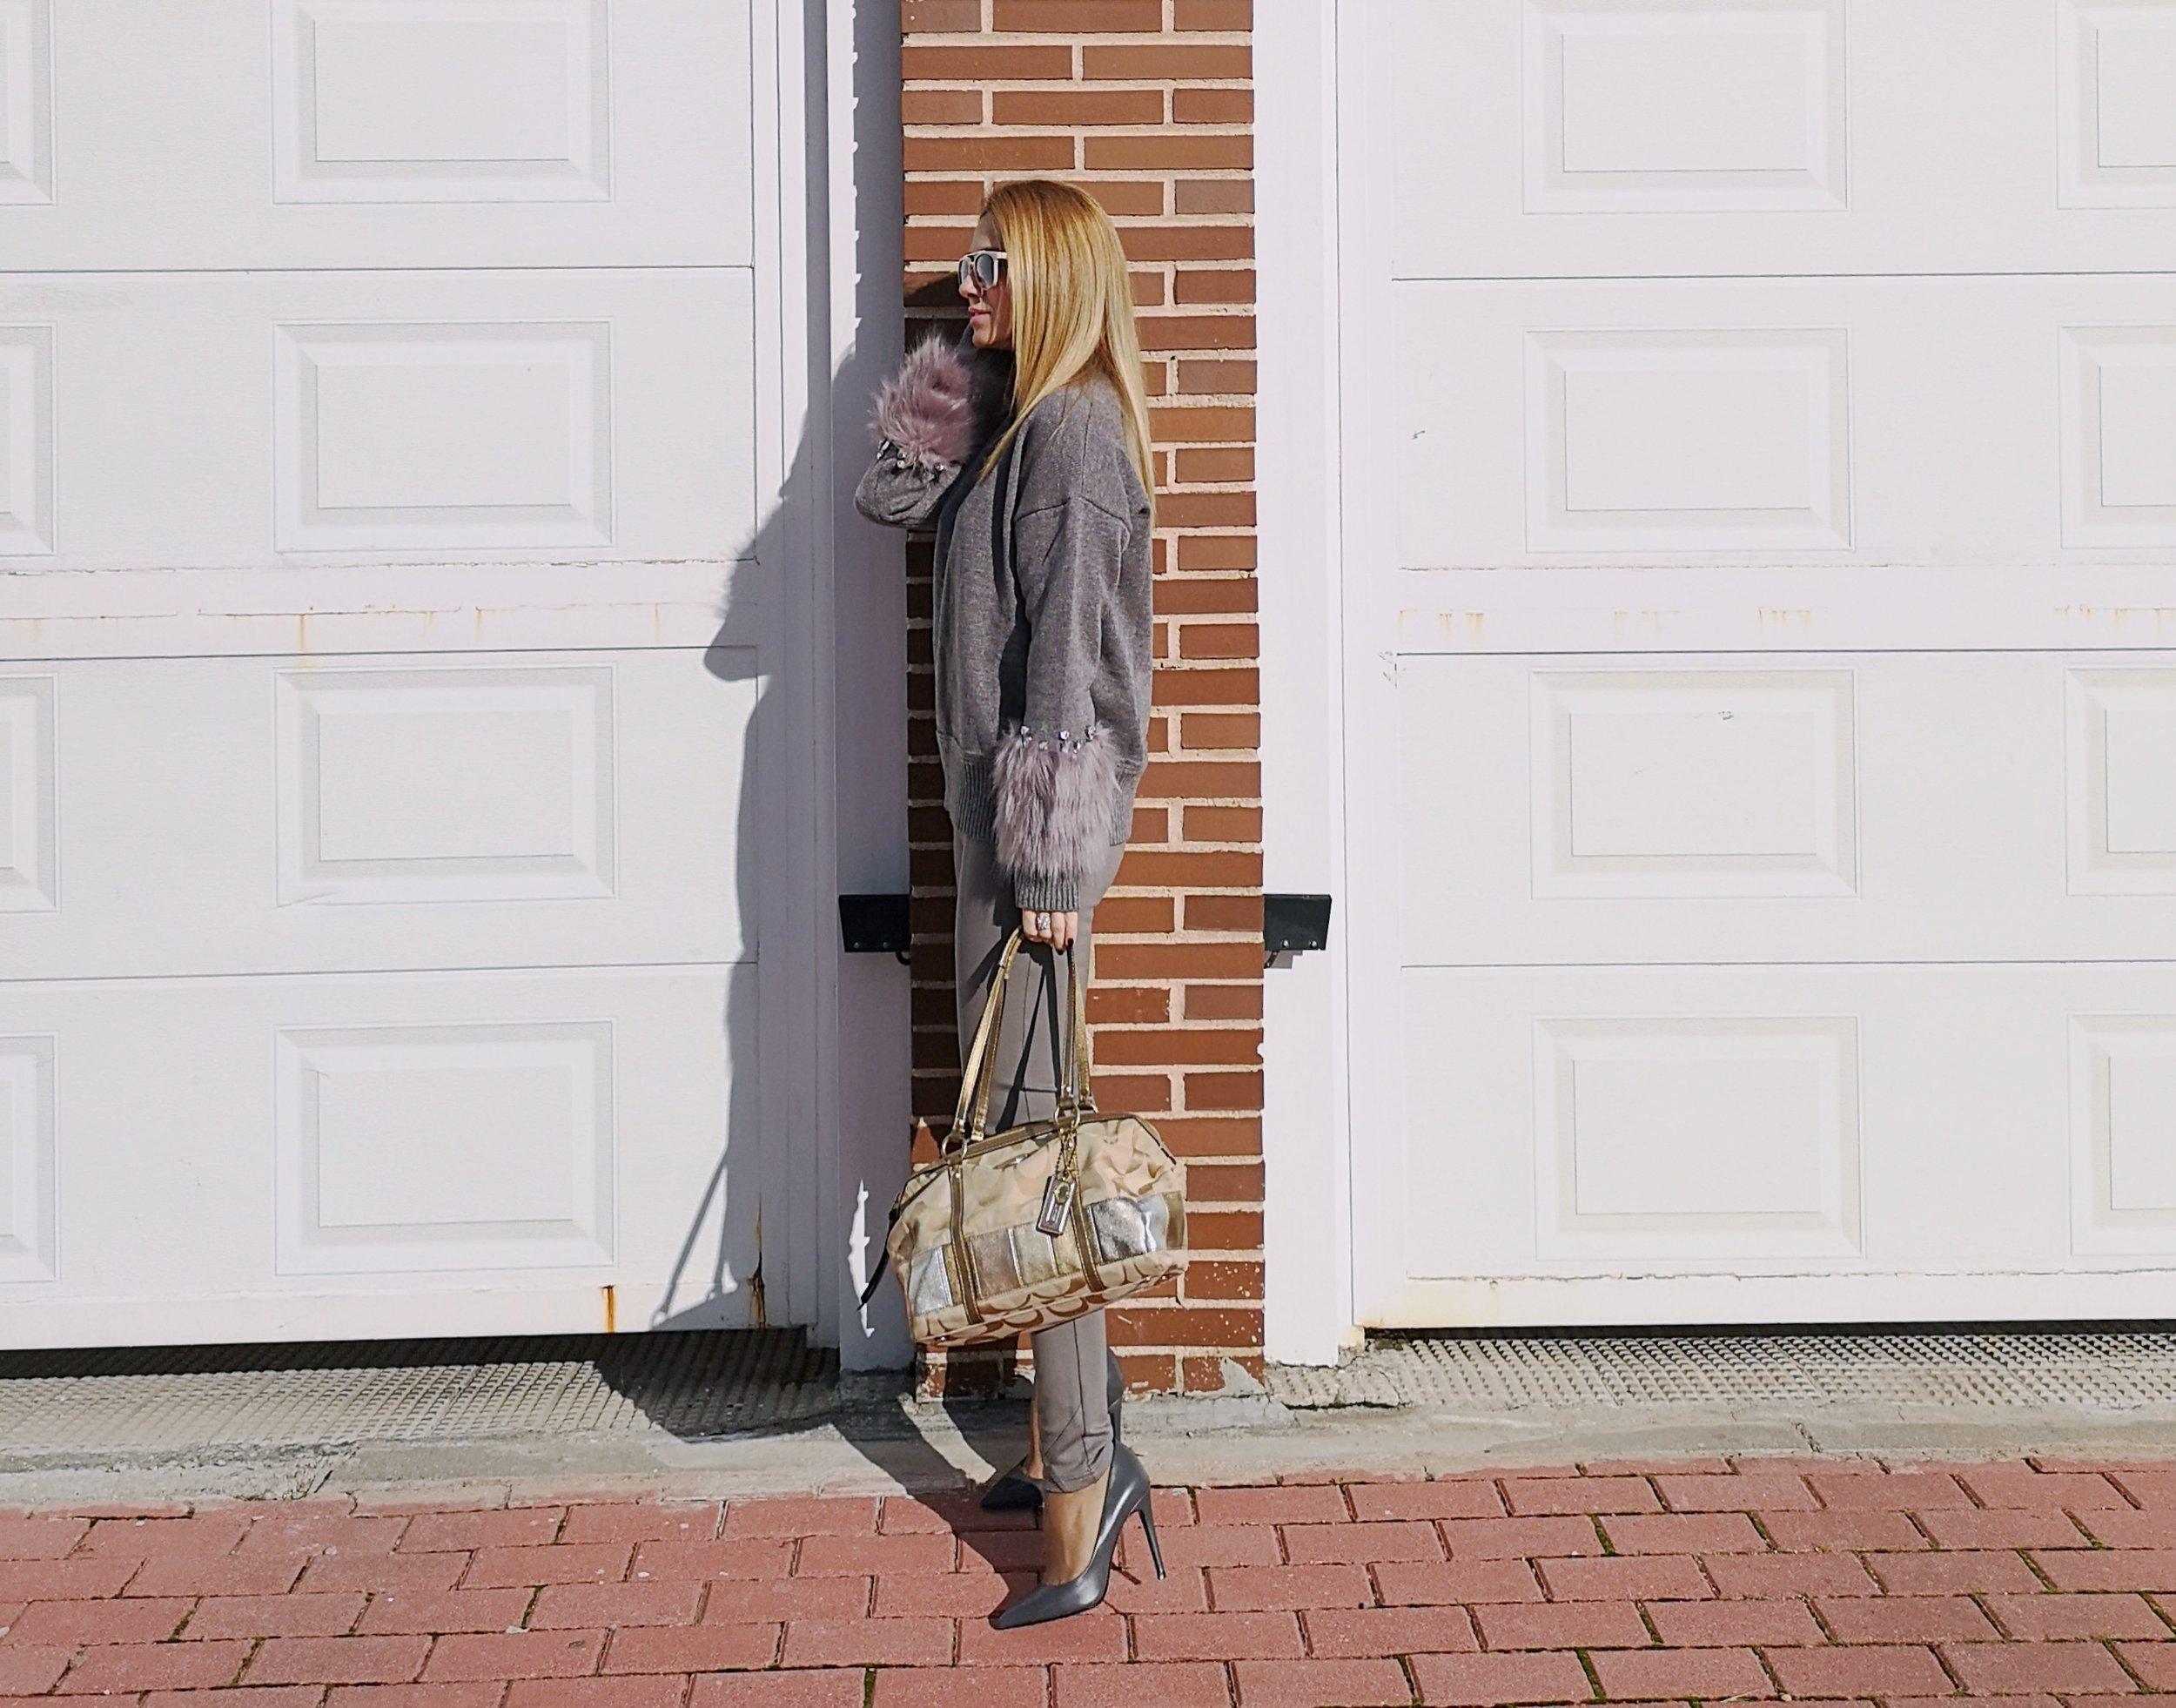 OUTFIT DETAILS: Sweater:  SHEIN ; Pants: BDBA; Shoes: ZARA (old); Bag: COACH; Sunnies: PARFOIS;